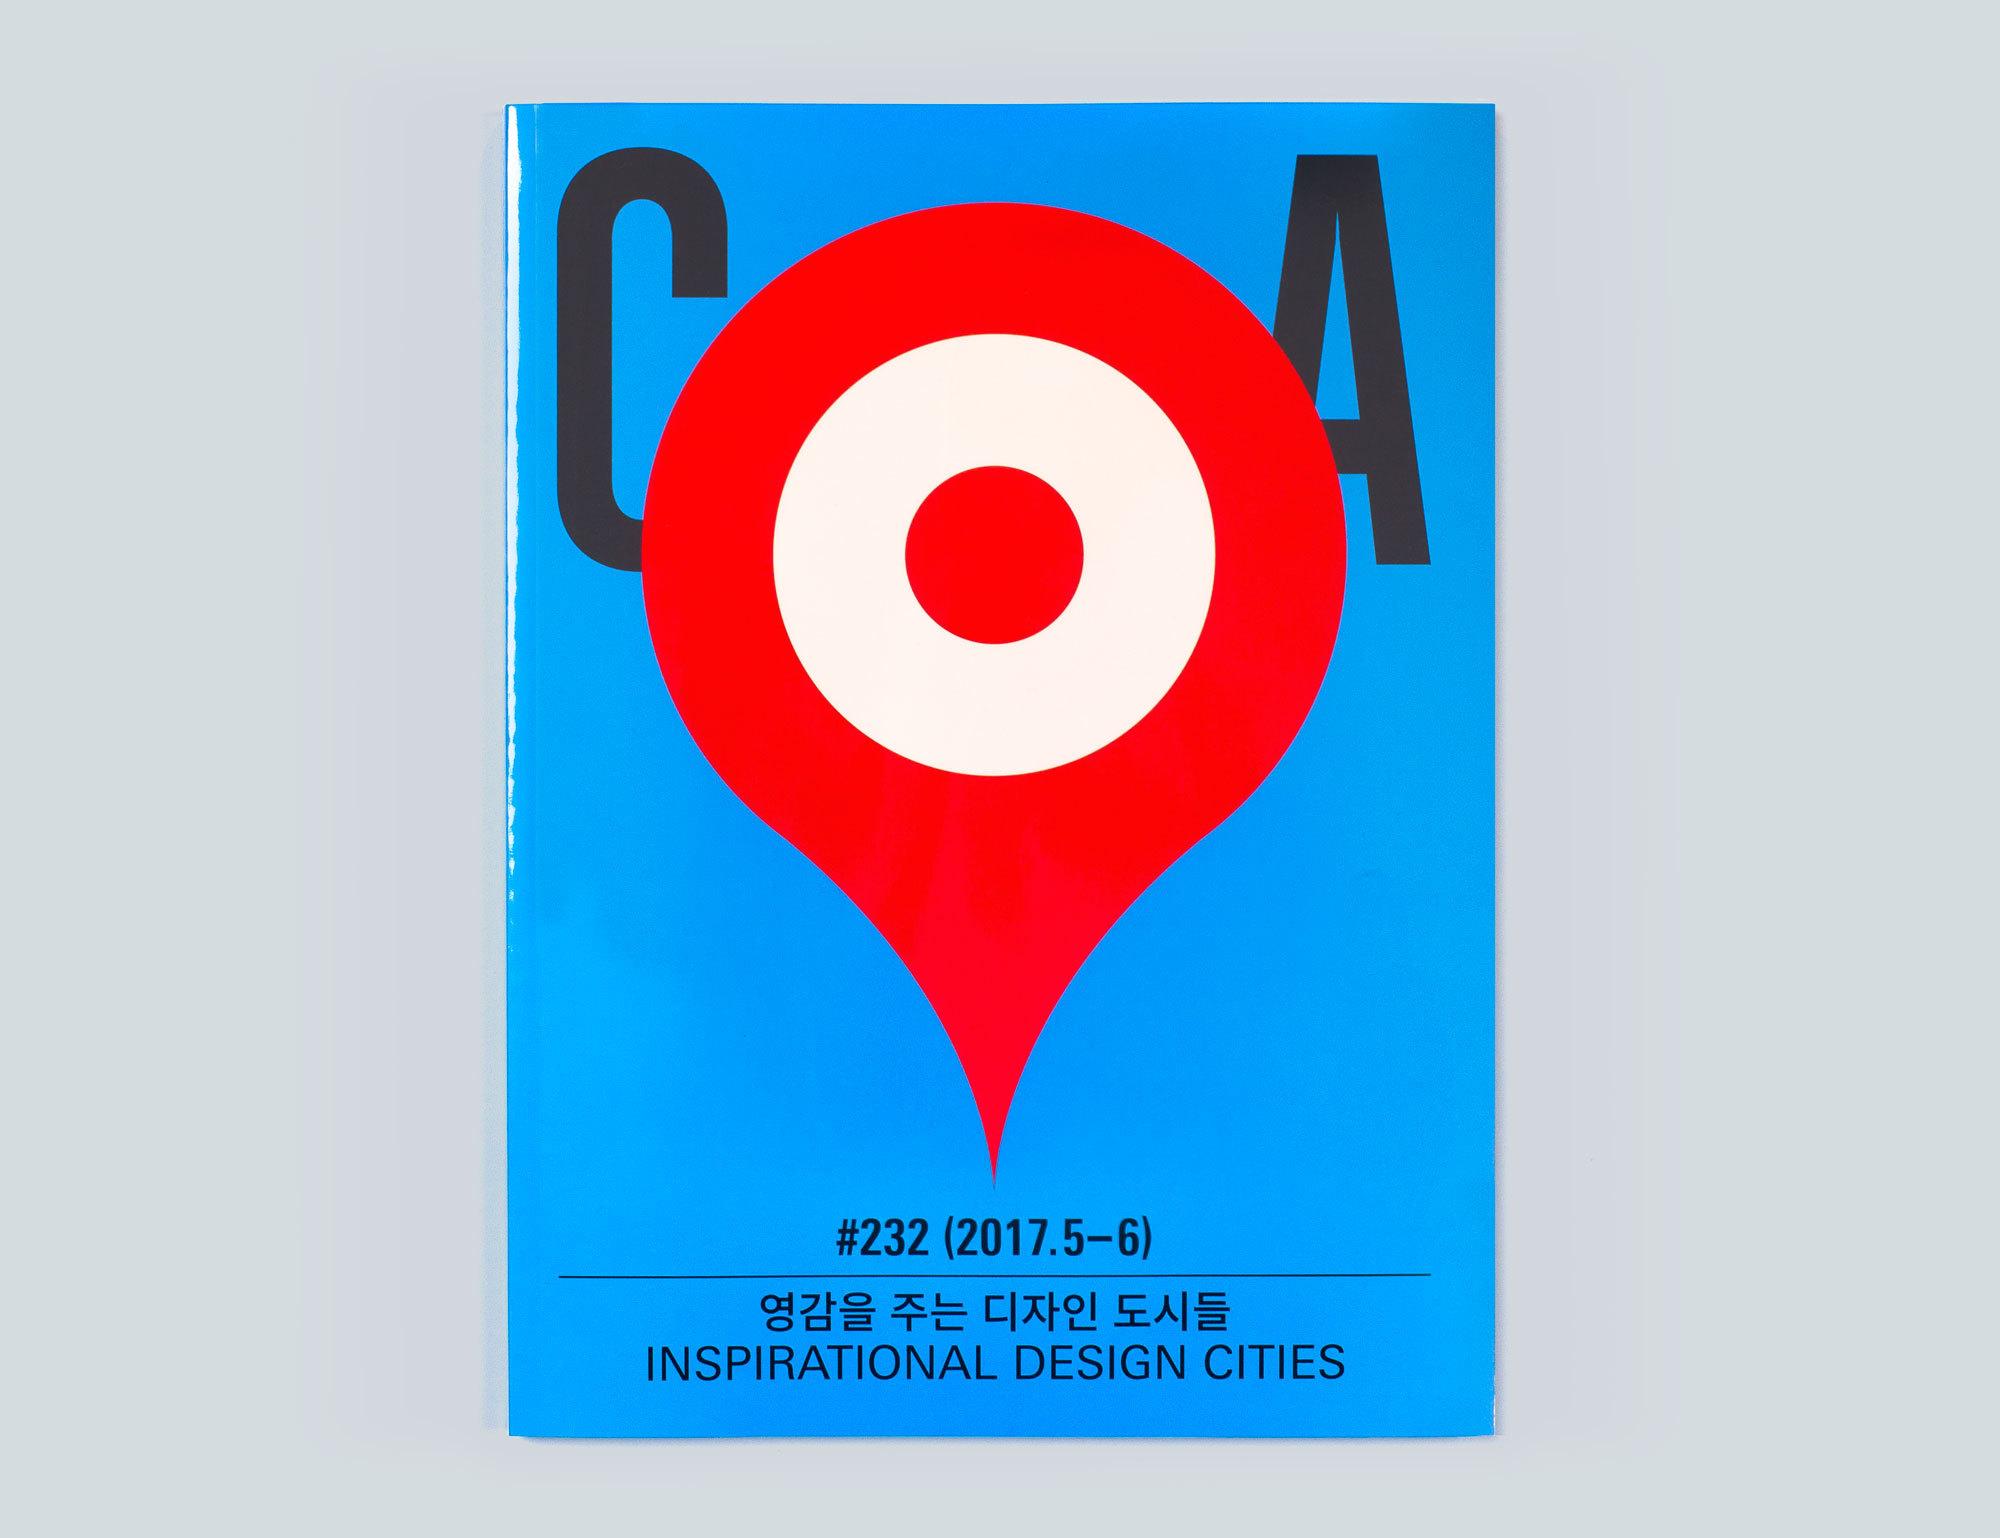 CAKorea03-2.jpg#asset:11447